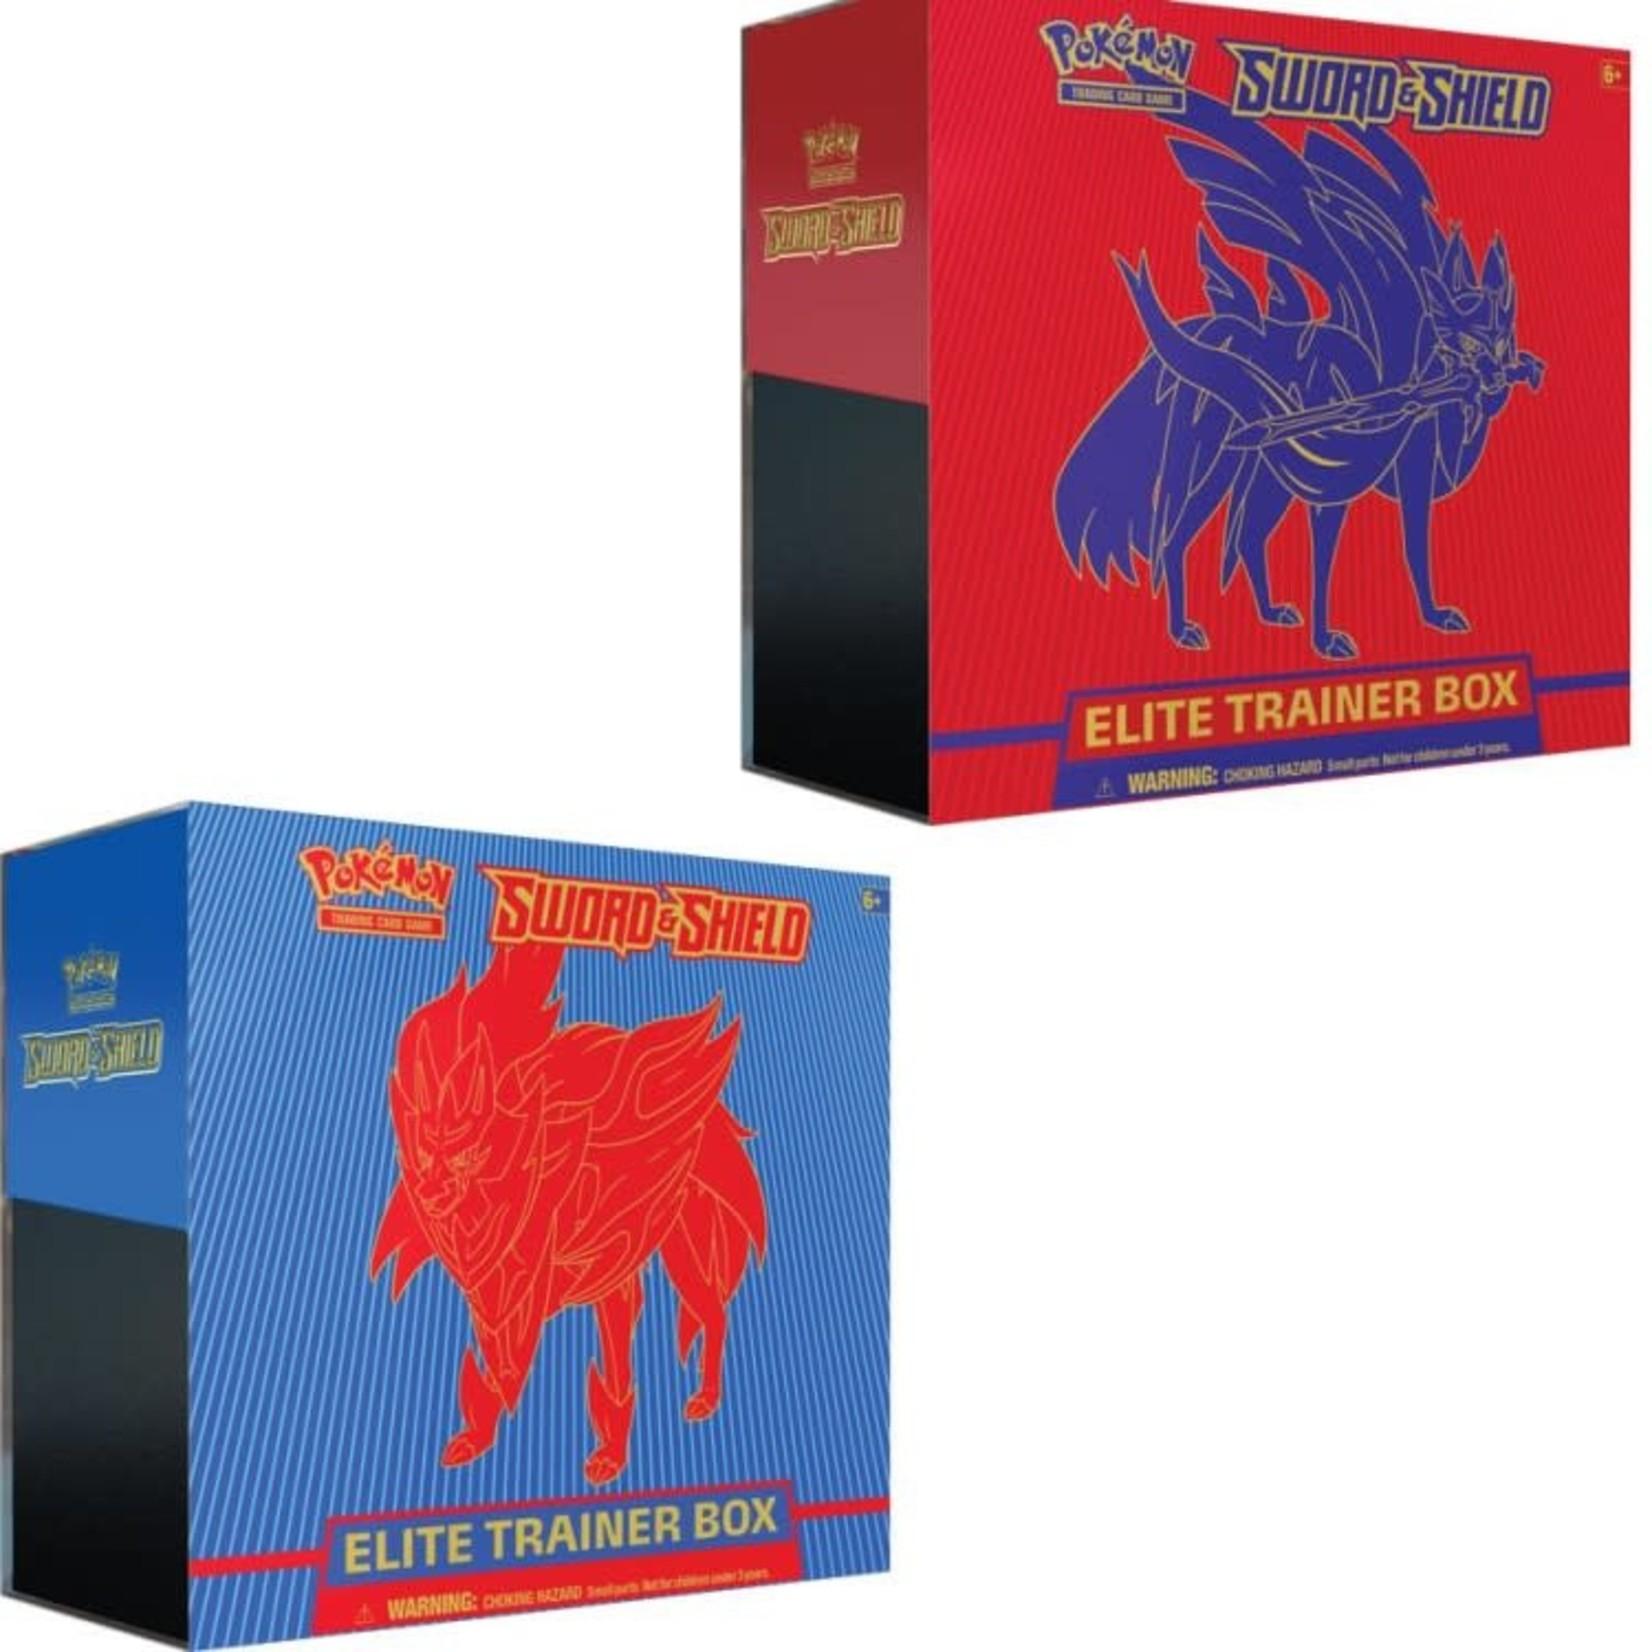 Pokemon International Pokemon Training Card Game: Sword and Shield Elite Trainer Box